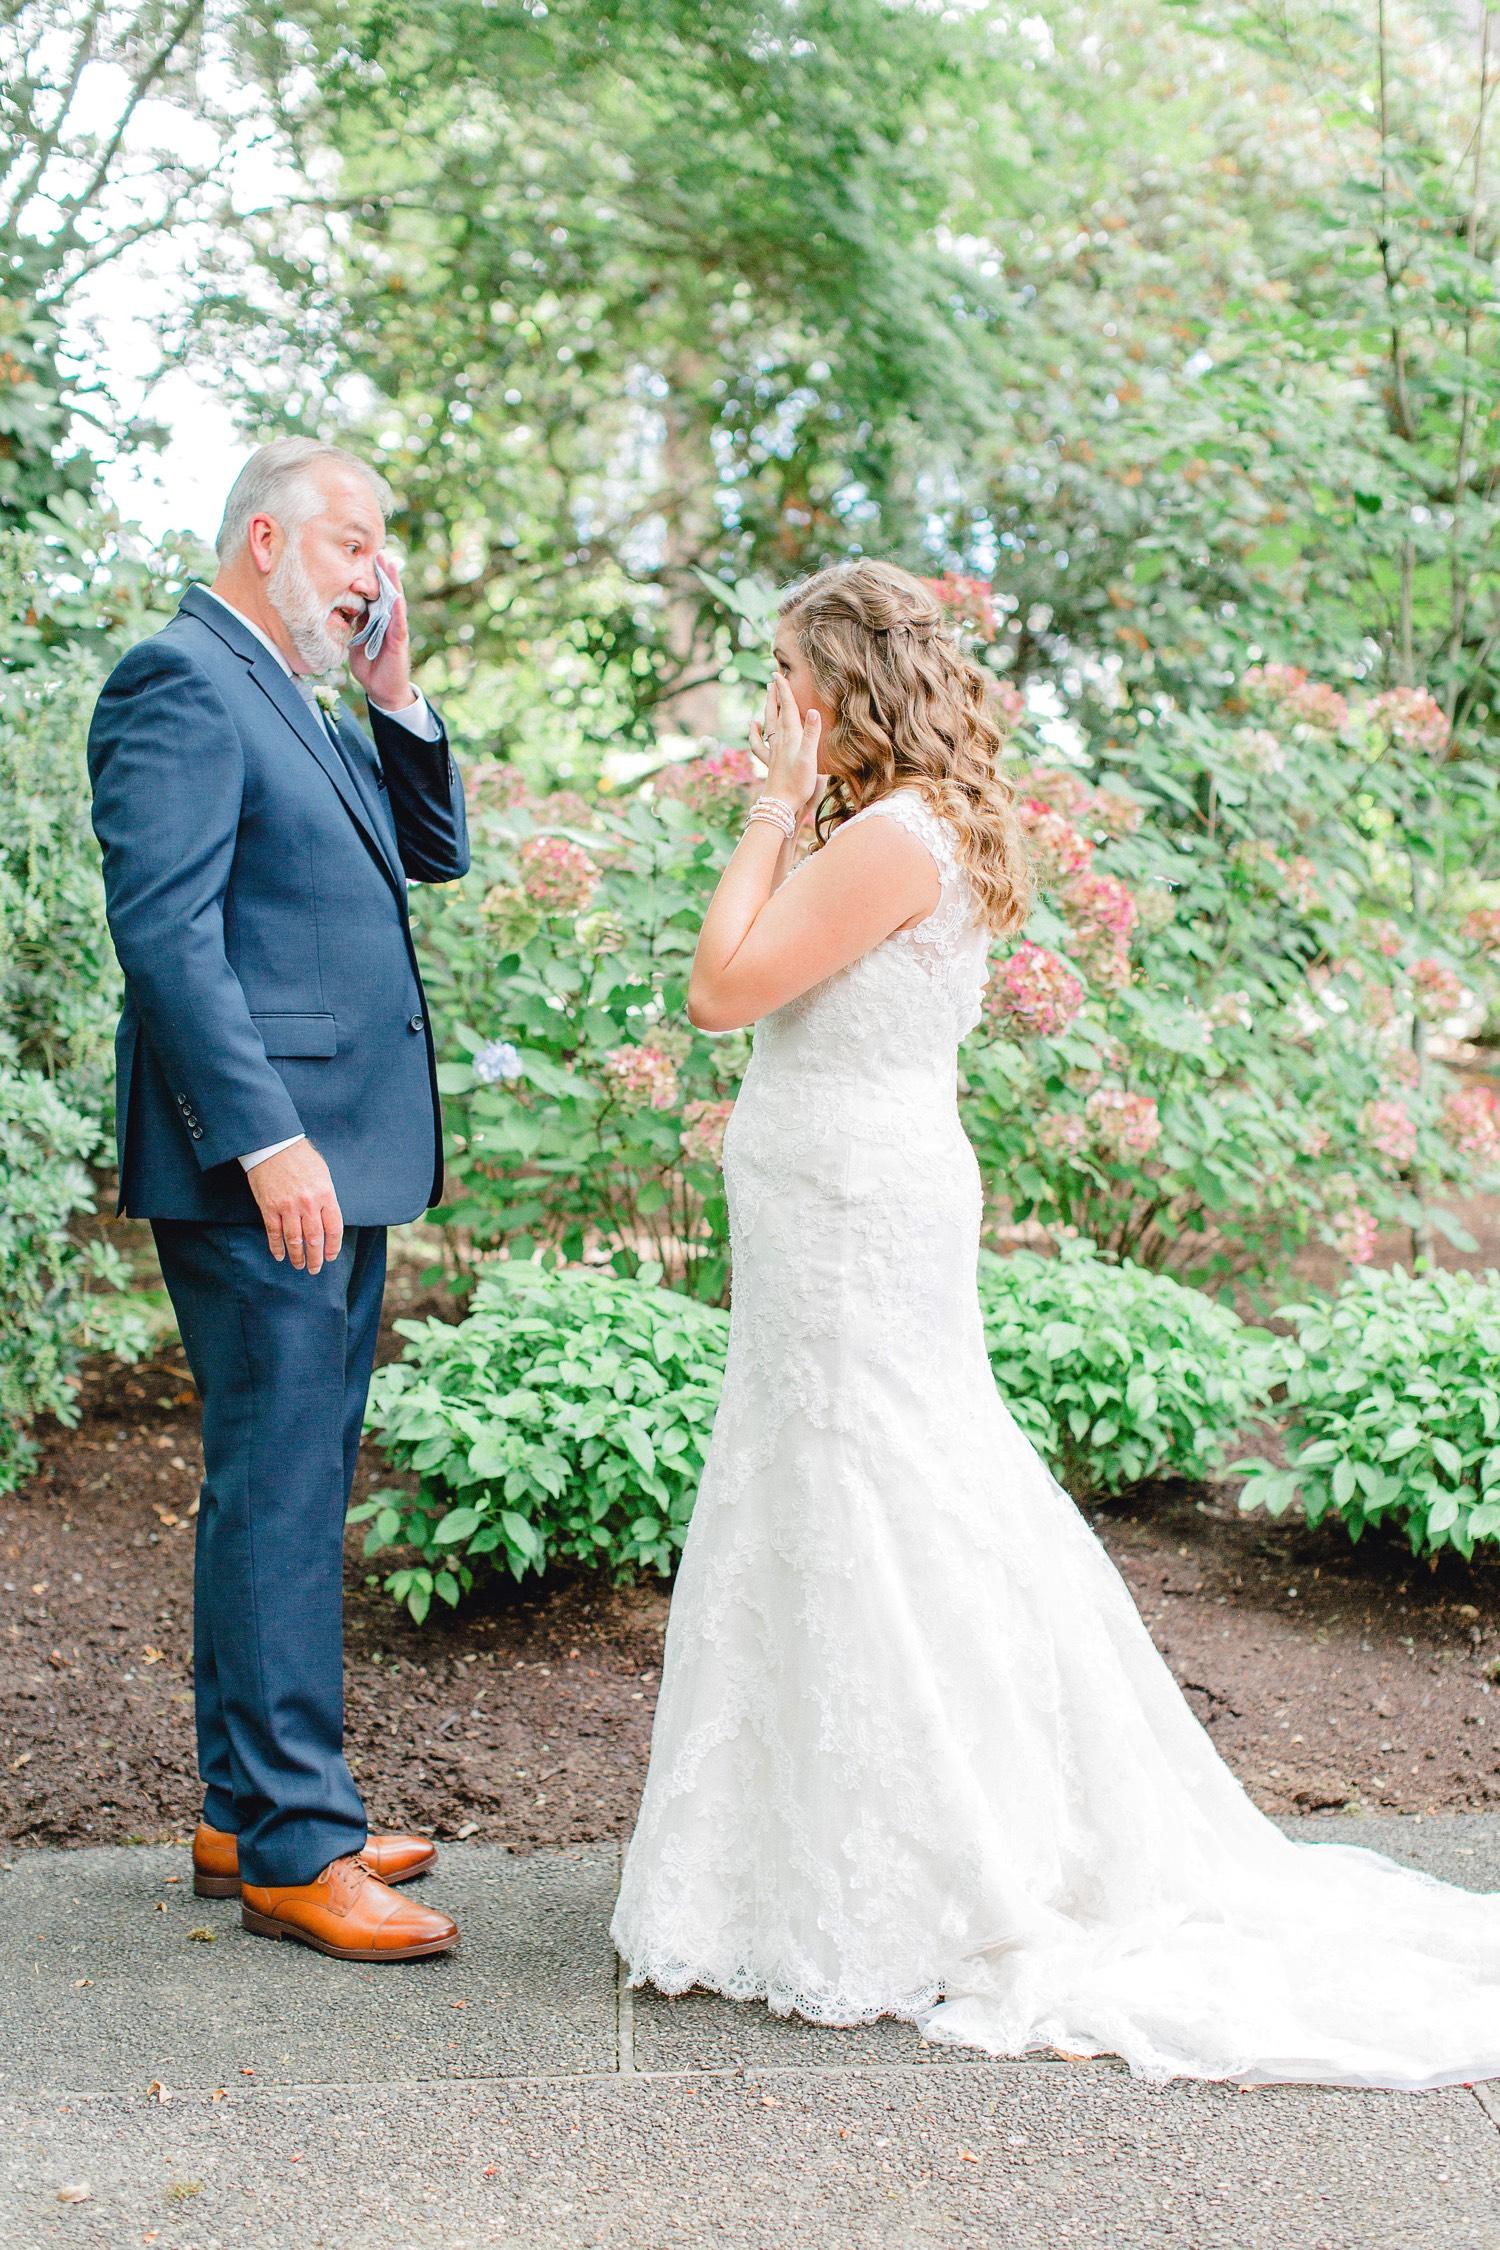 0000000000024_emmarosecompany_katiematt-9559_Photographer_PNW_House_Robinswood_Emma_Light_Company_Airy_Rose_and_Wedding_Seattle.jpg